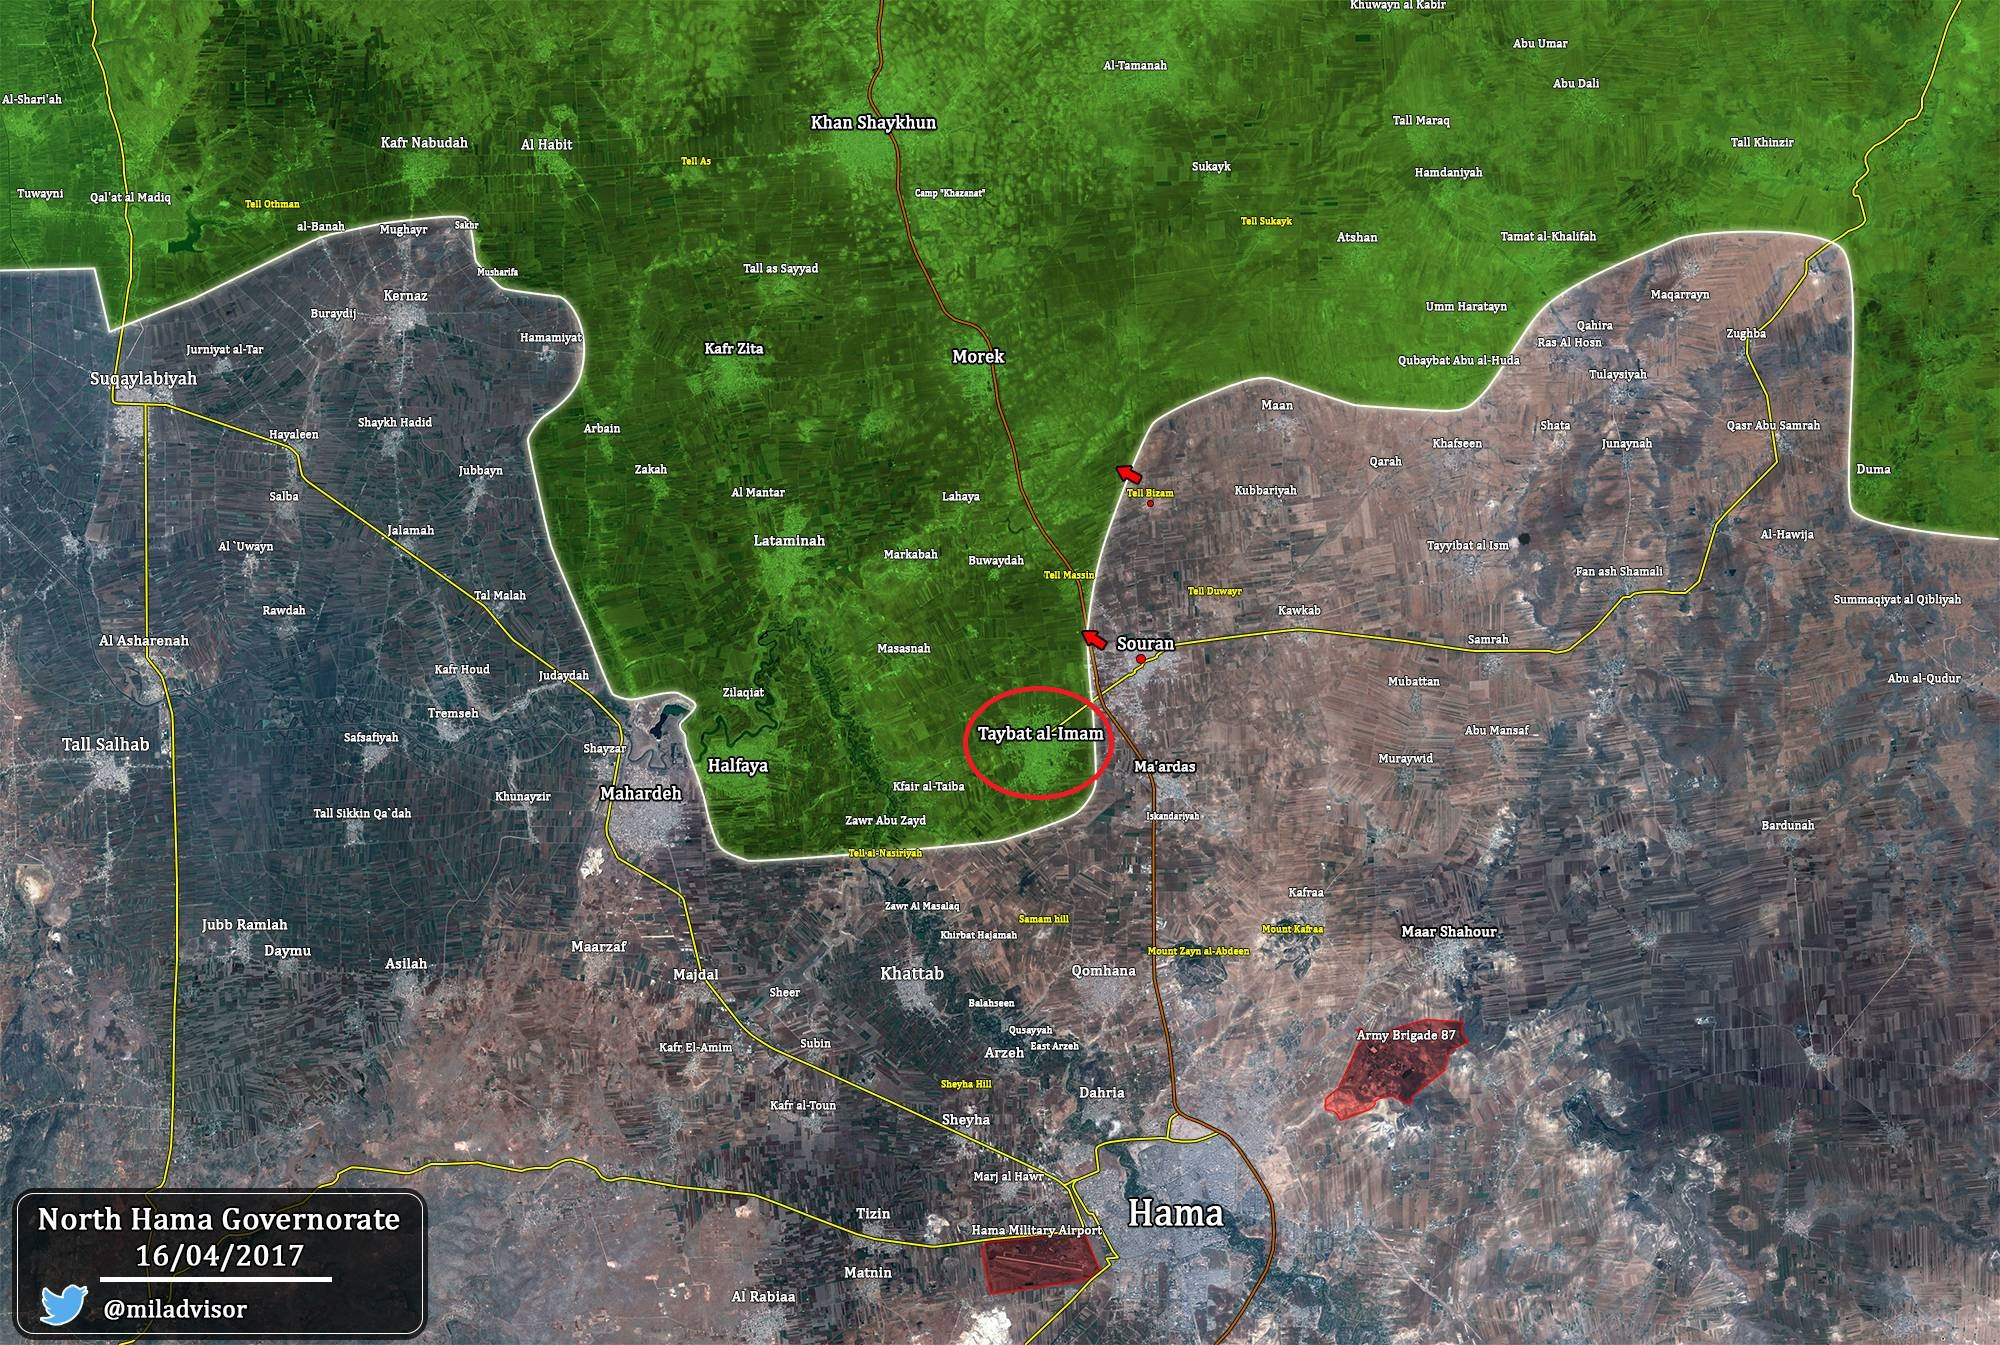 Syrian Army Artillery And Air Force Striking Taybat Al-Imam In Northern Hama